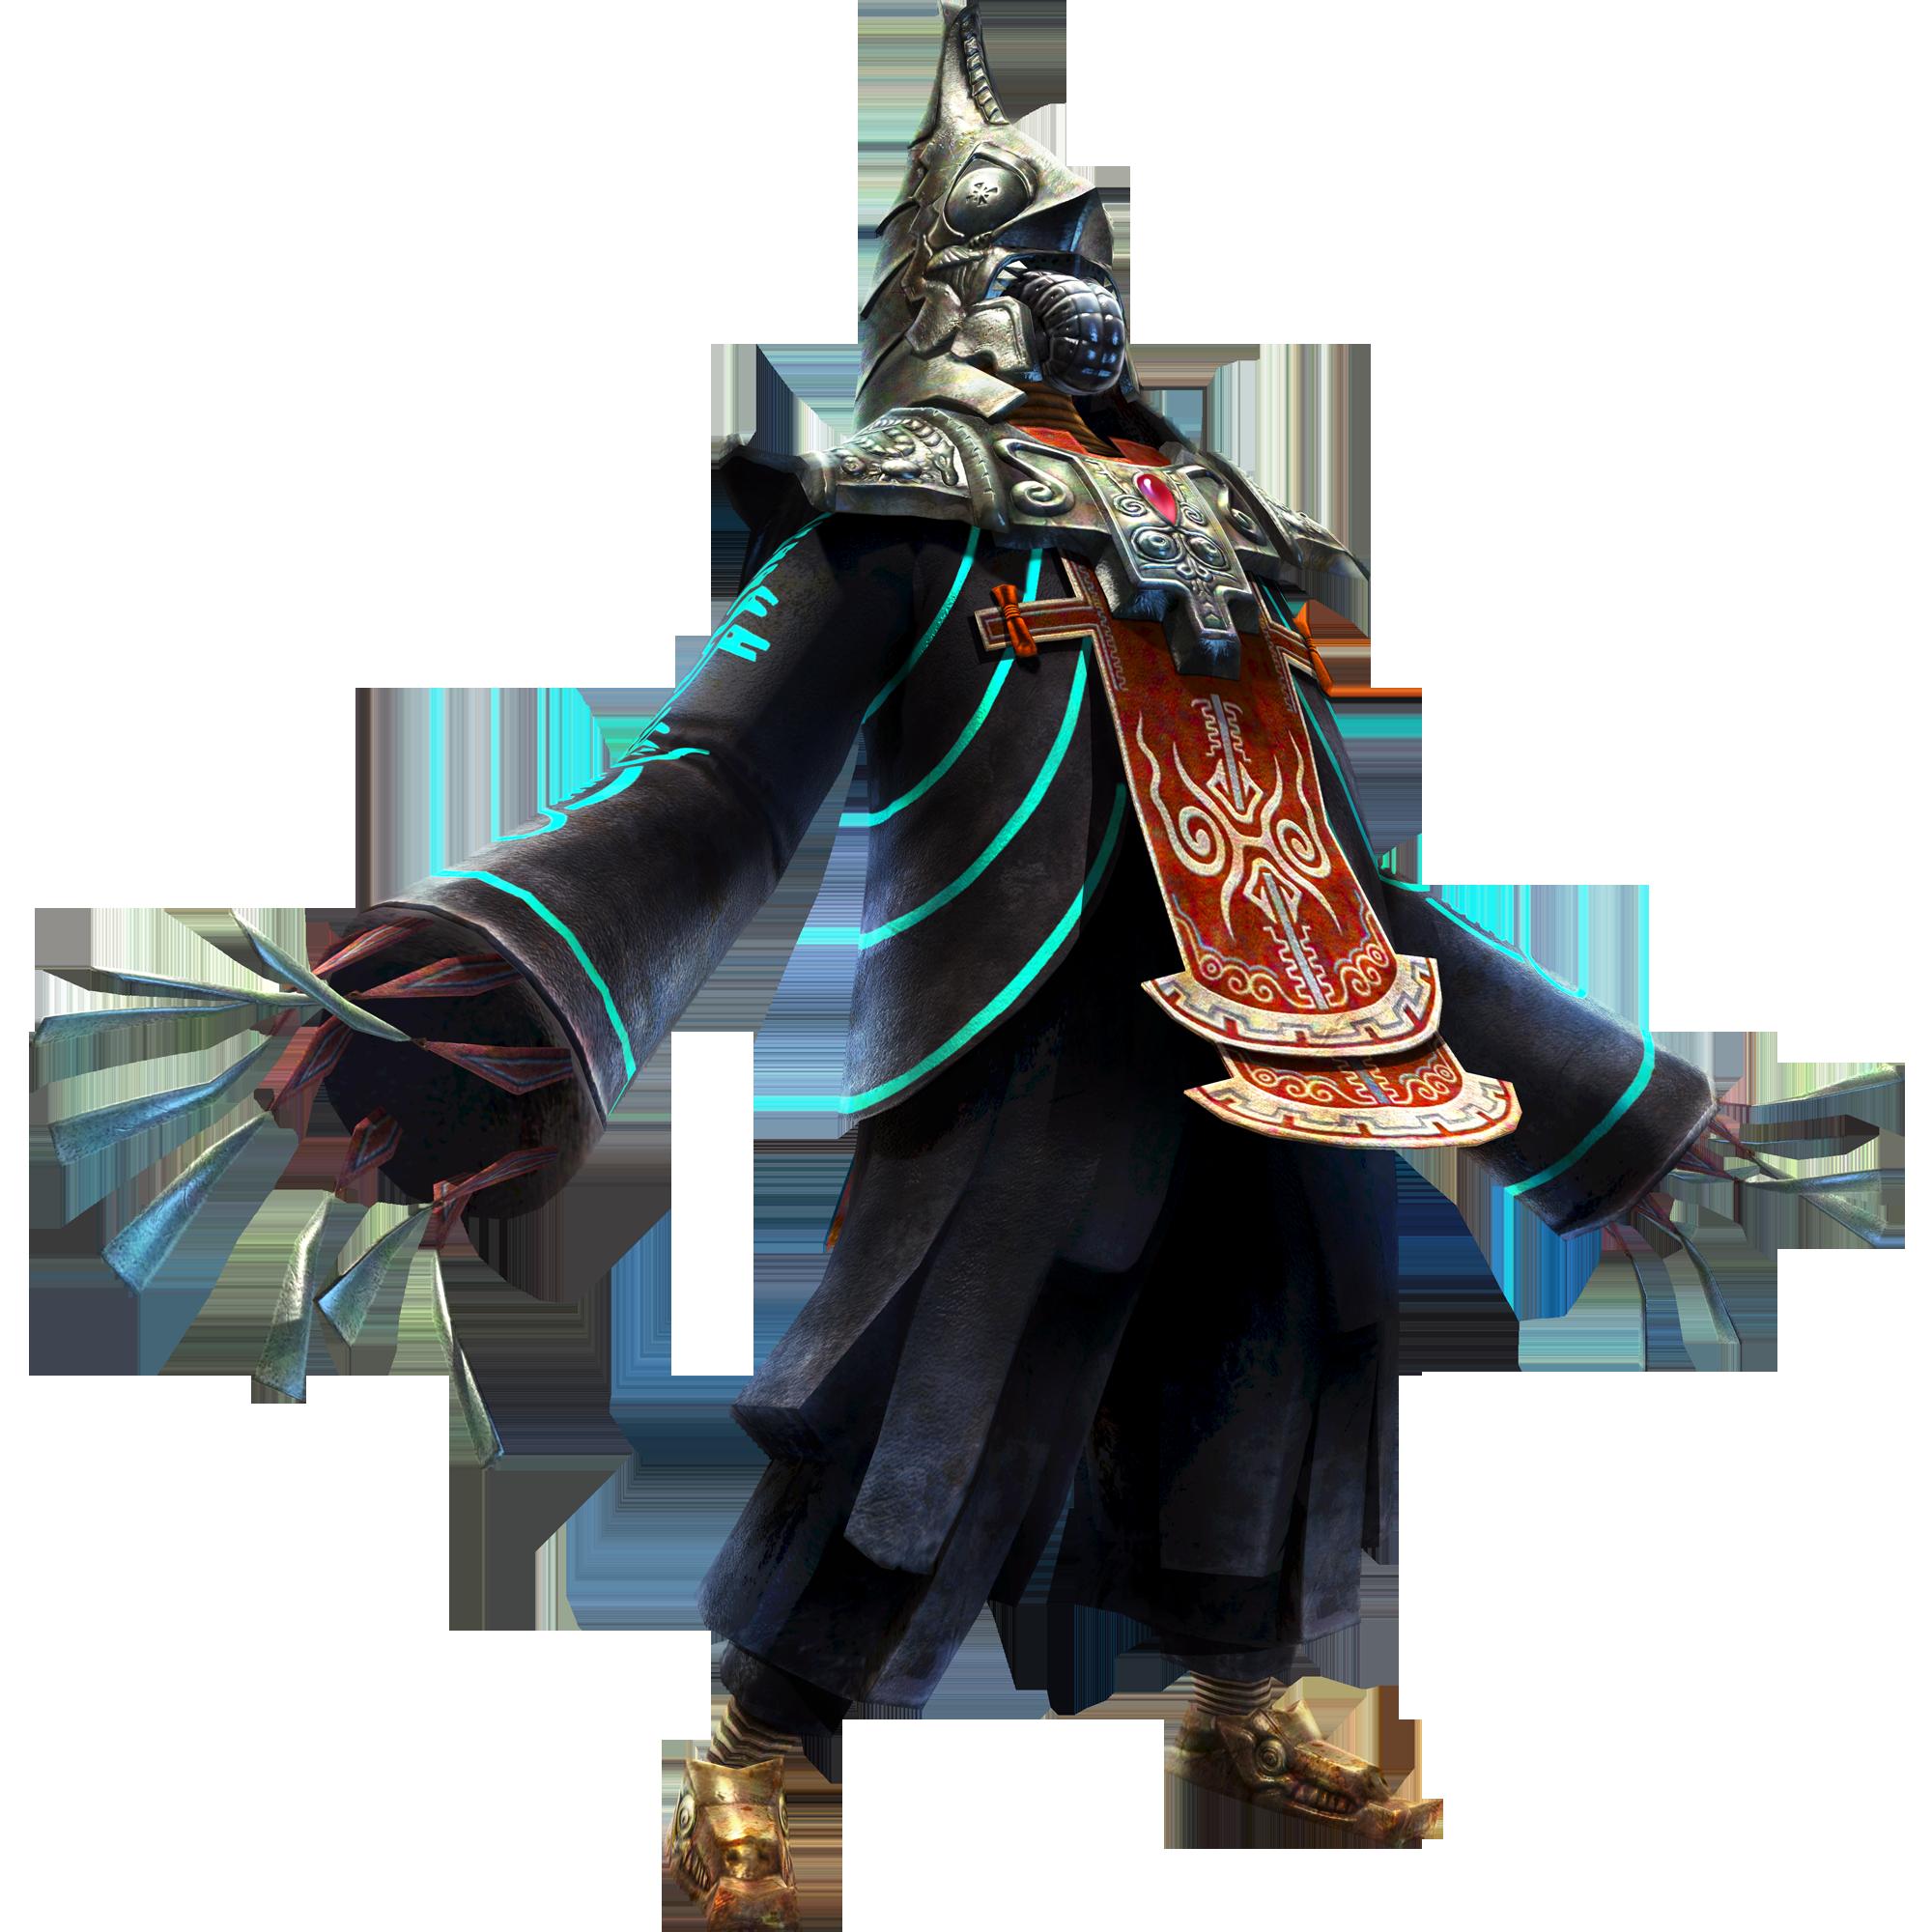 Warriors Orochi 3 World S End: Dynasty Warriors, Samurai Warriors